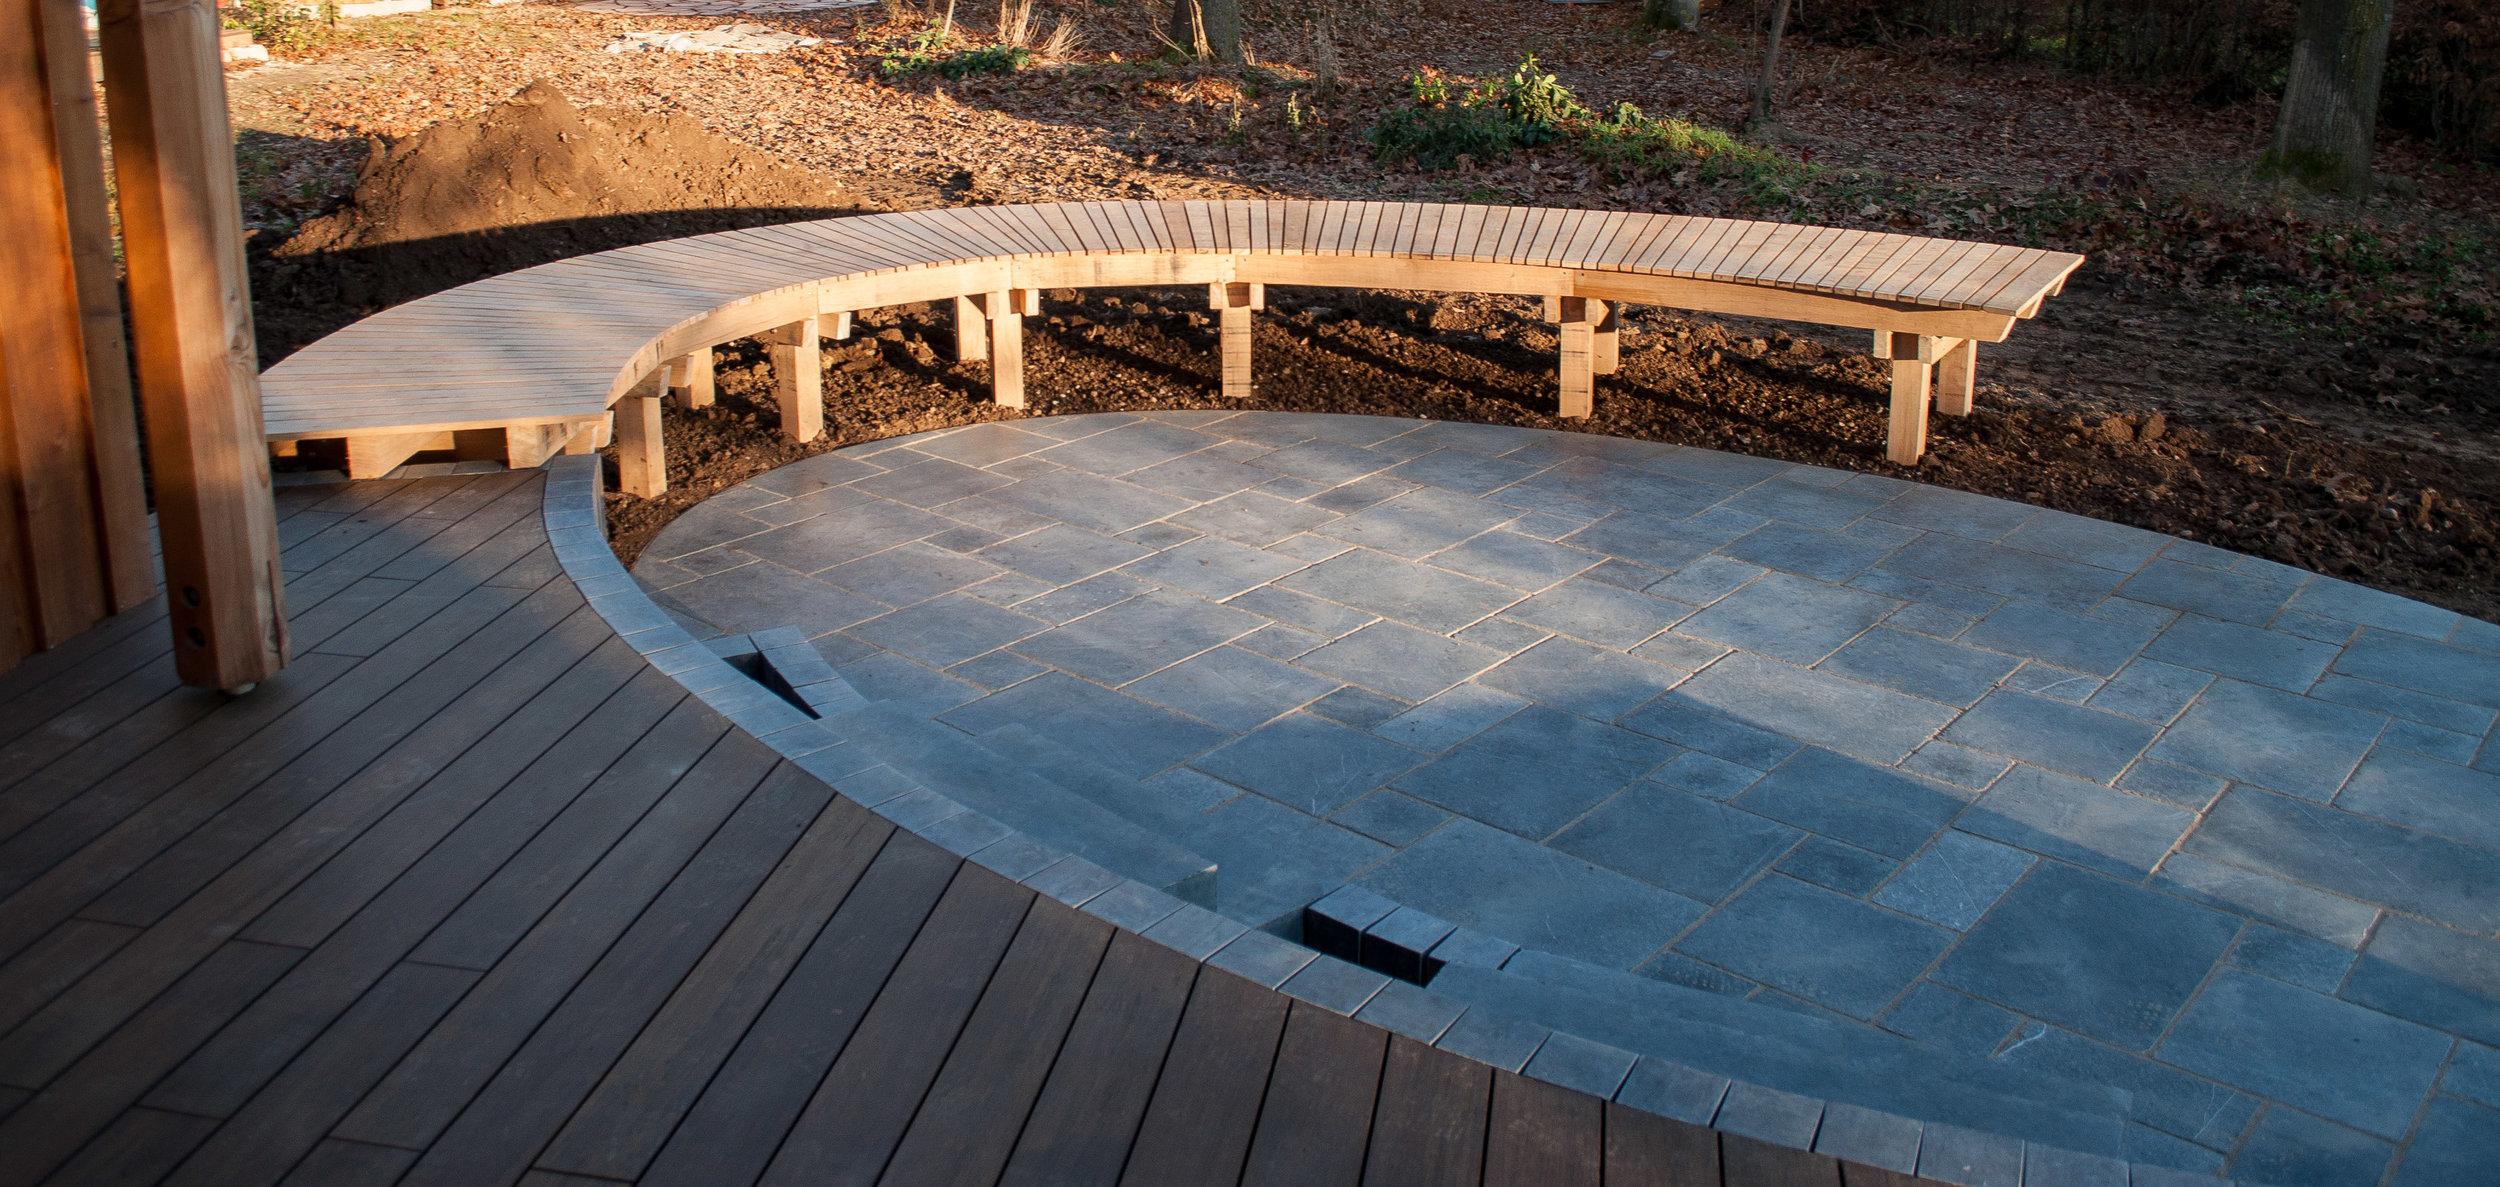 Terrasse moderne01-04-2017 à 15:12:02 9.jpg